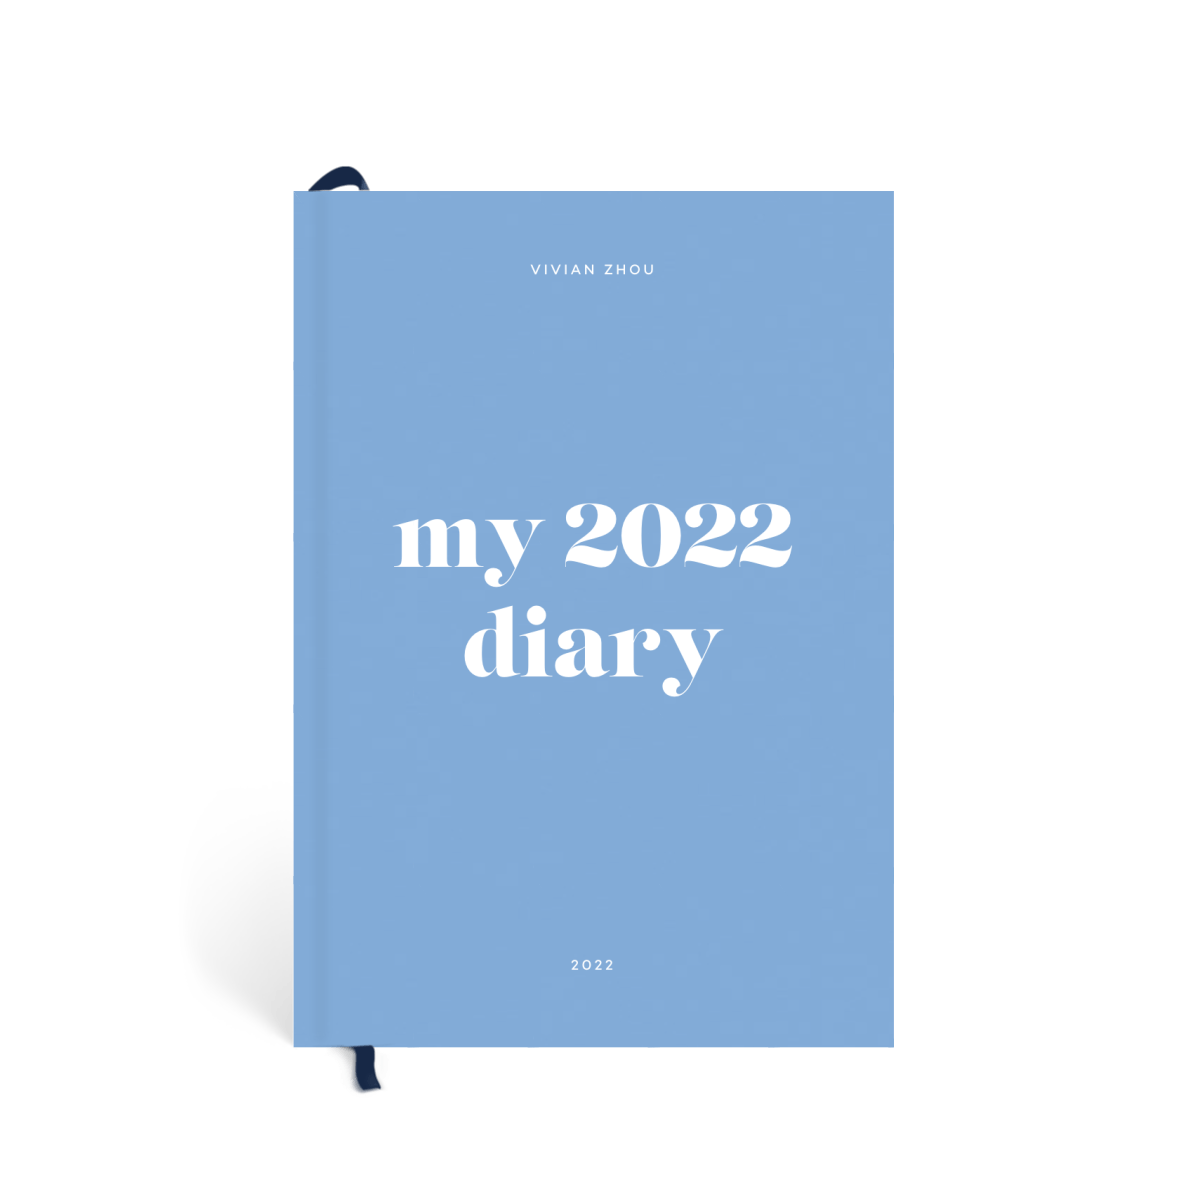 Mid Dusty Blue